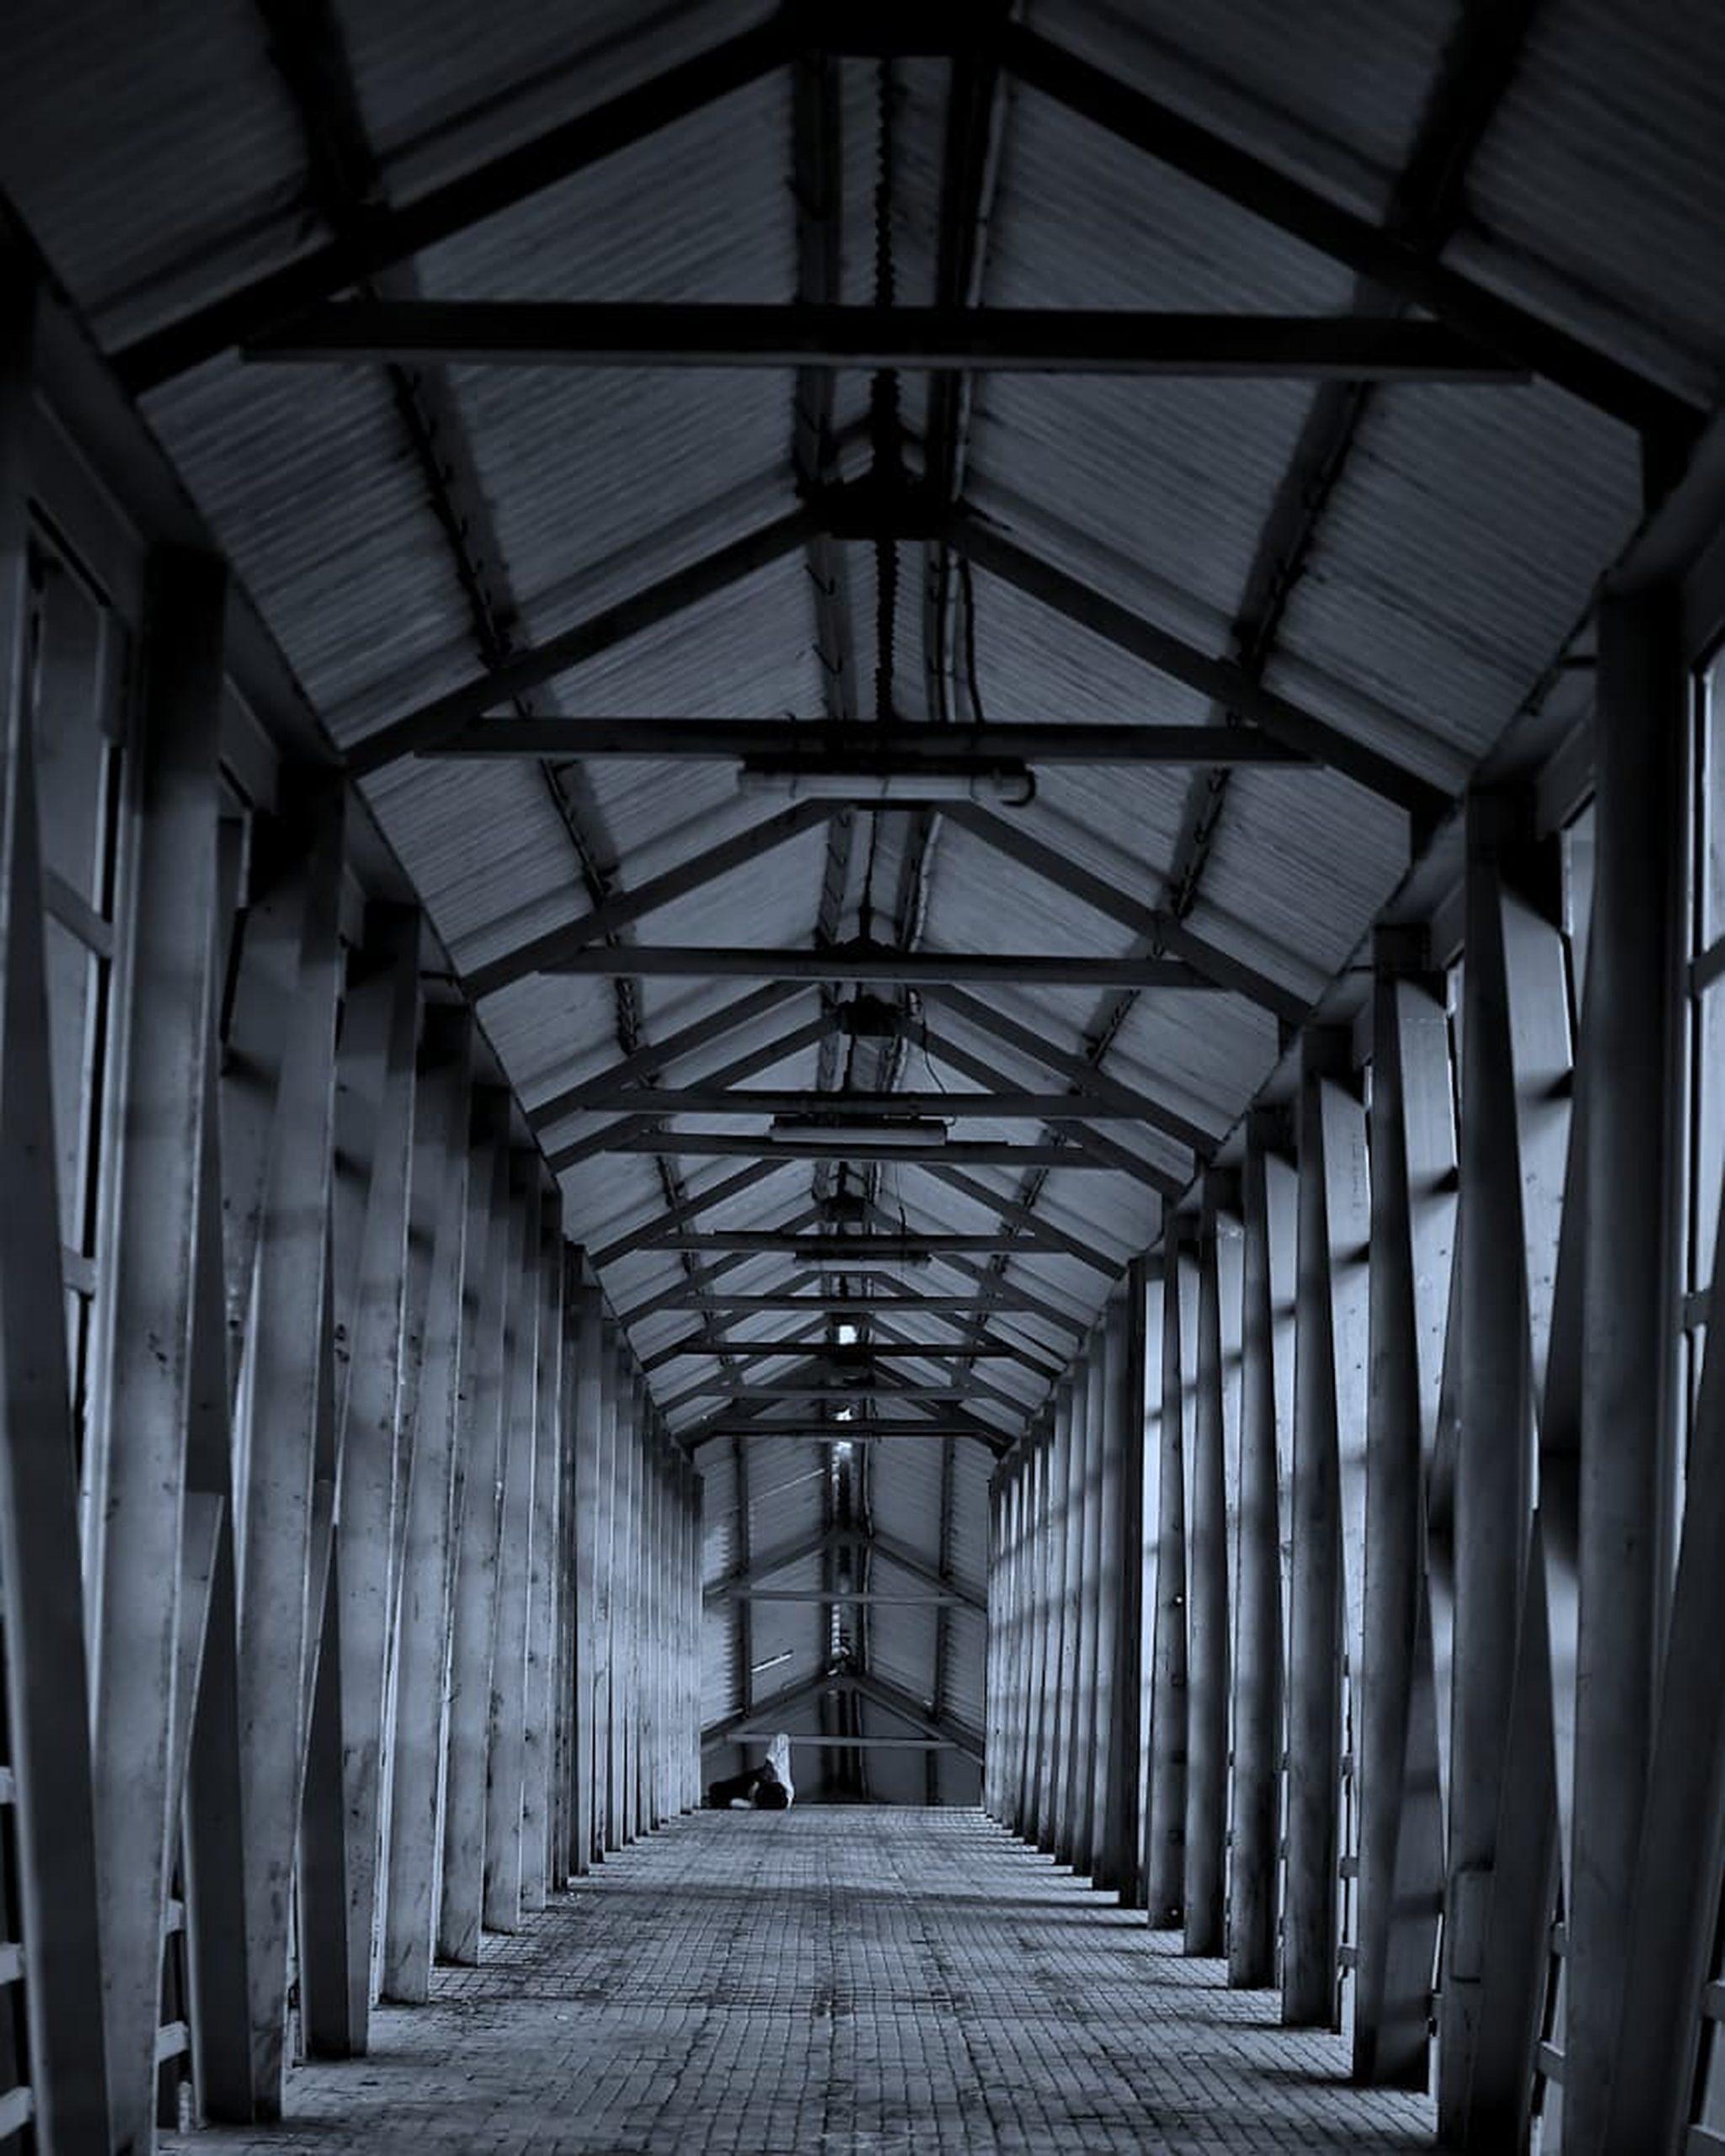 A footbridge at a railway station